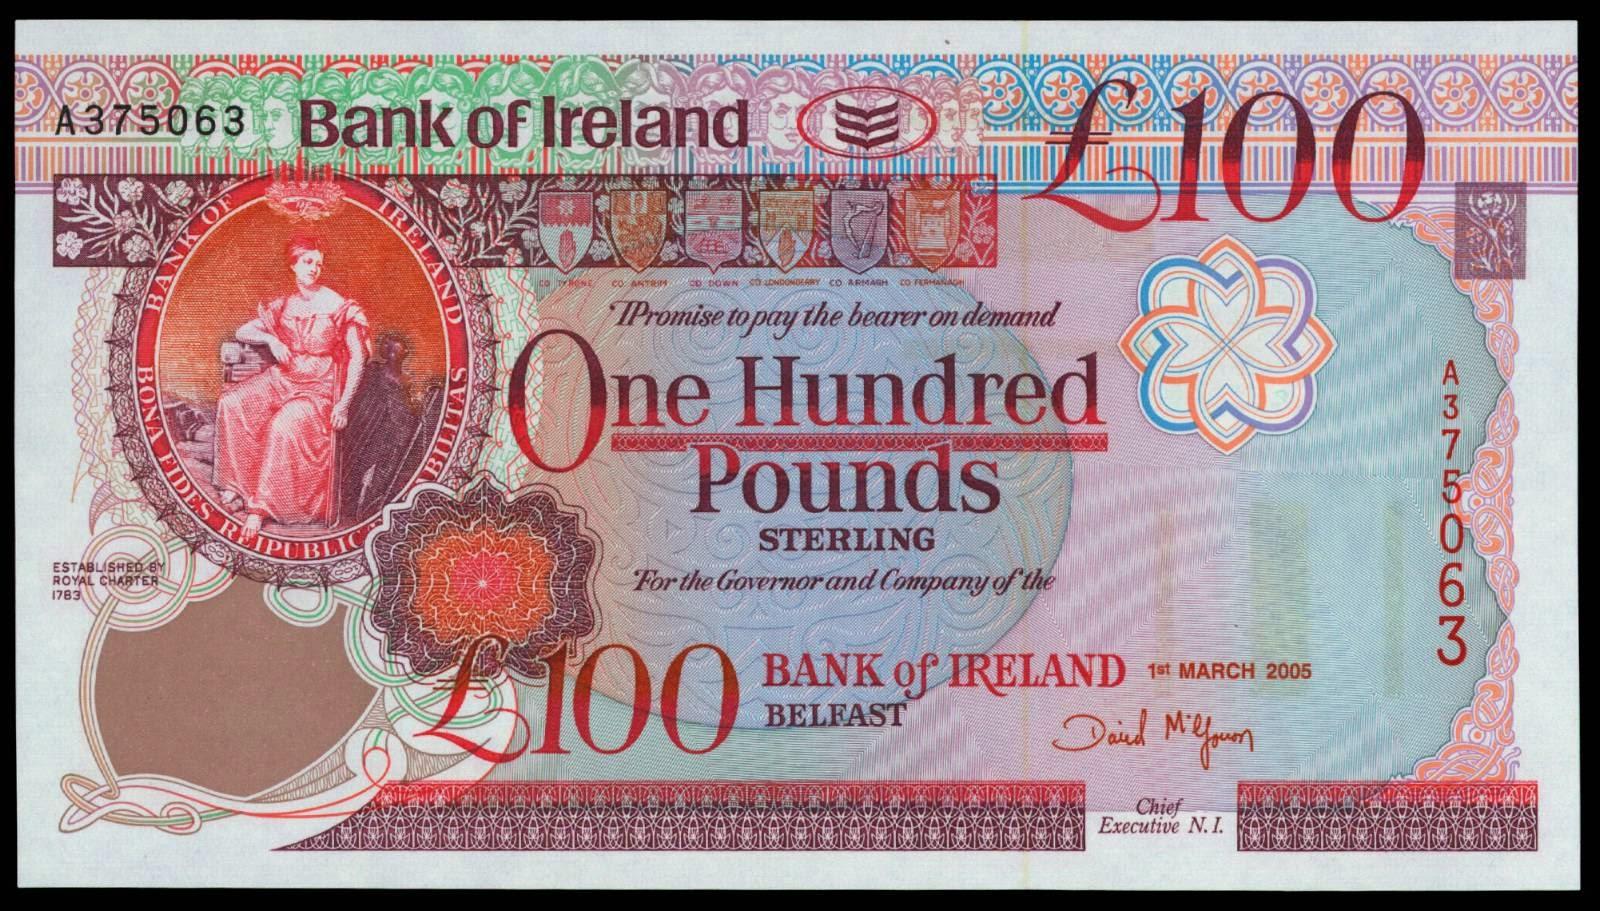 bank of ireland 100 pound note 2005world banknotes